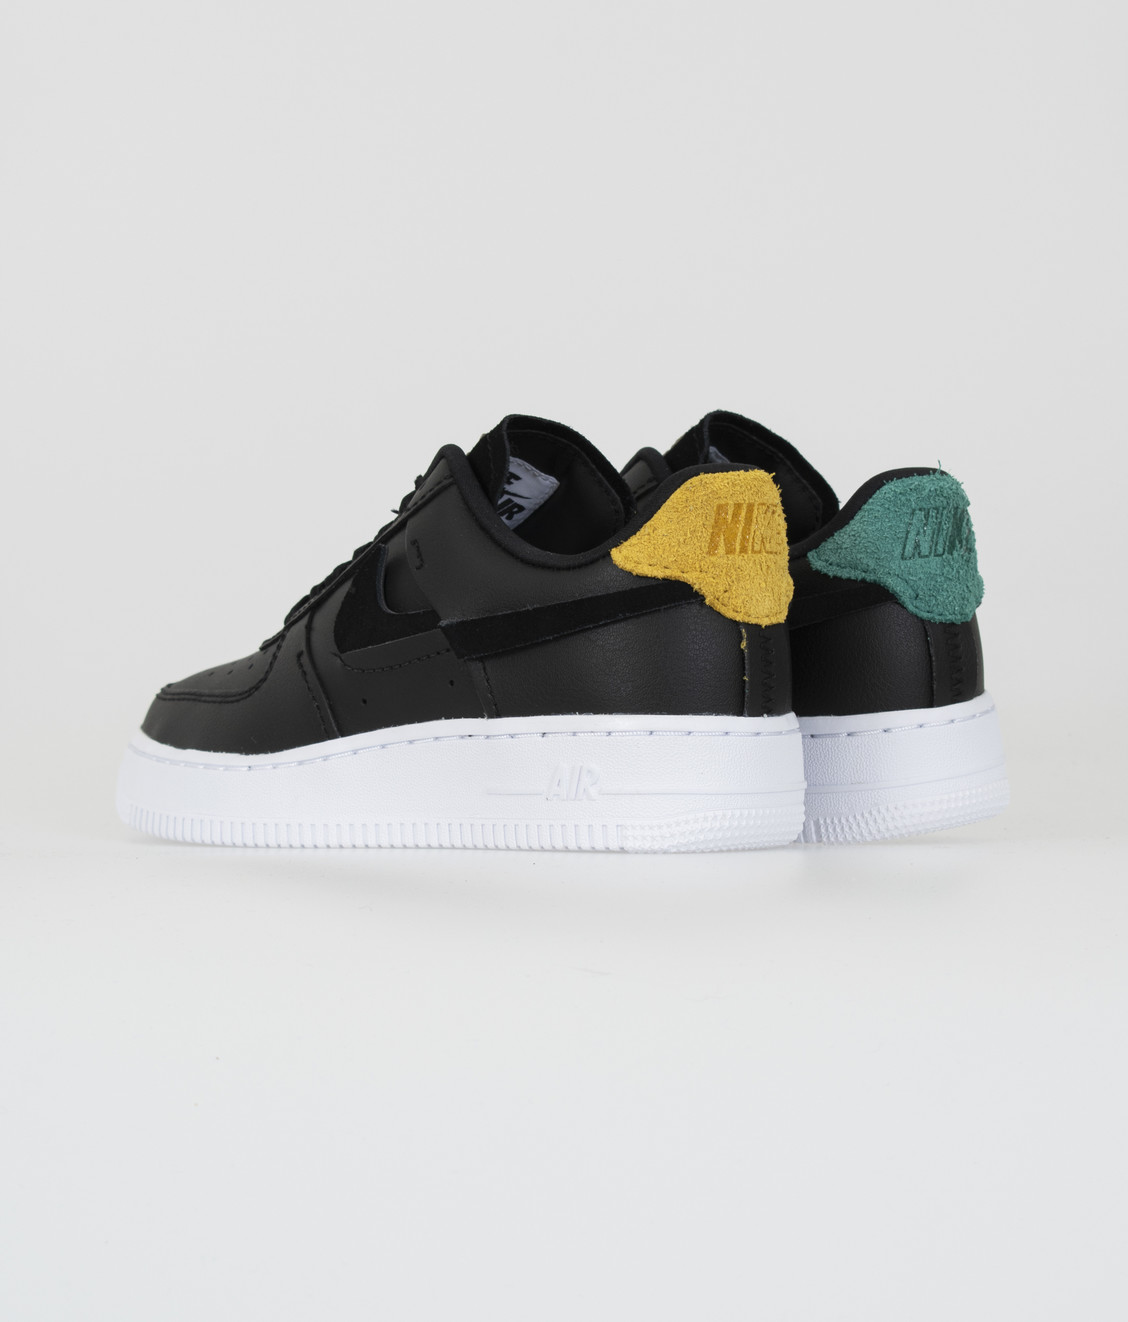 Nike Nike Air Force 1 Lux Vandalized Black